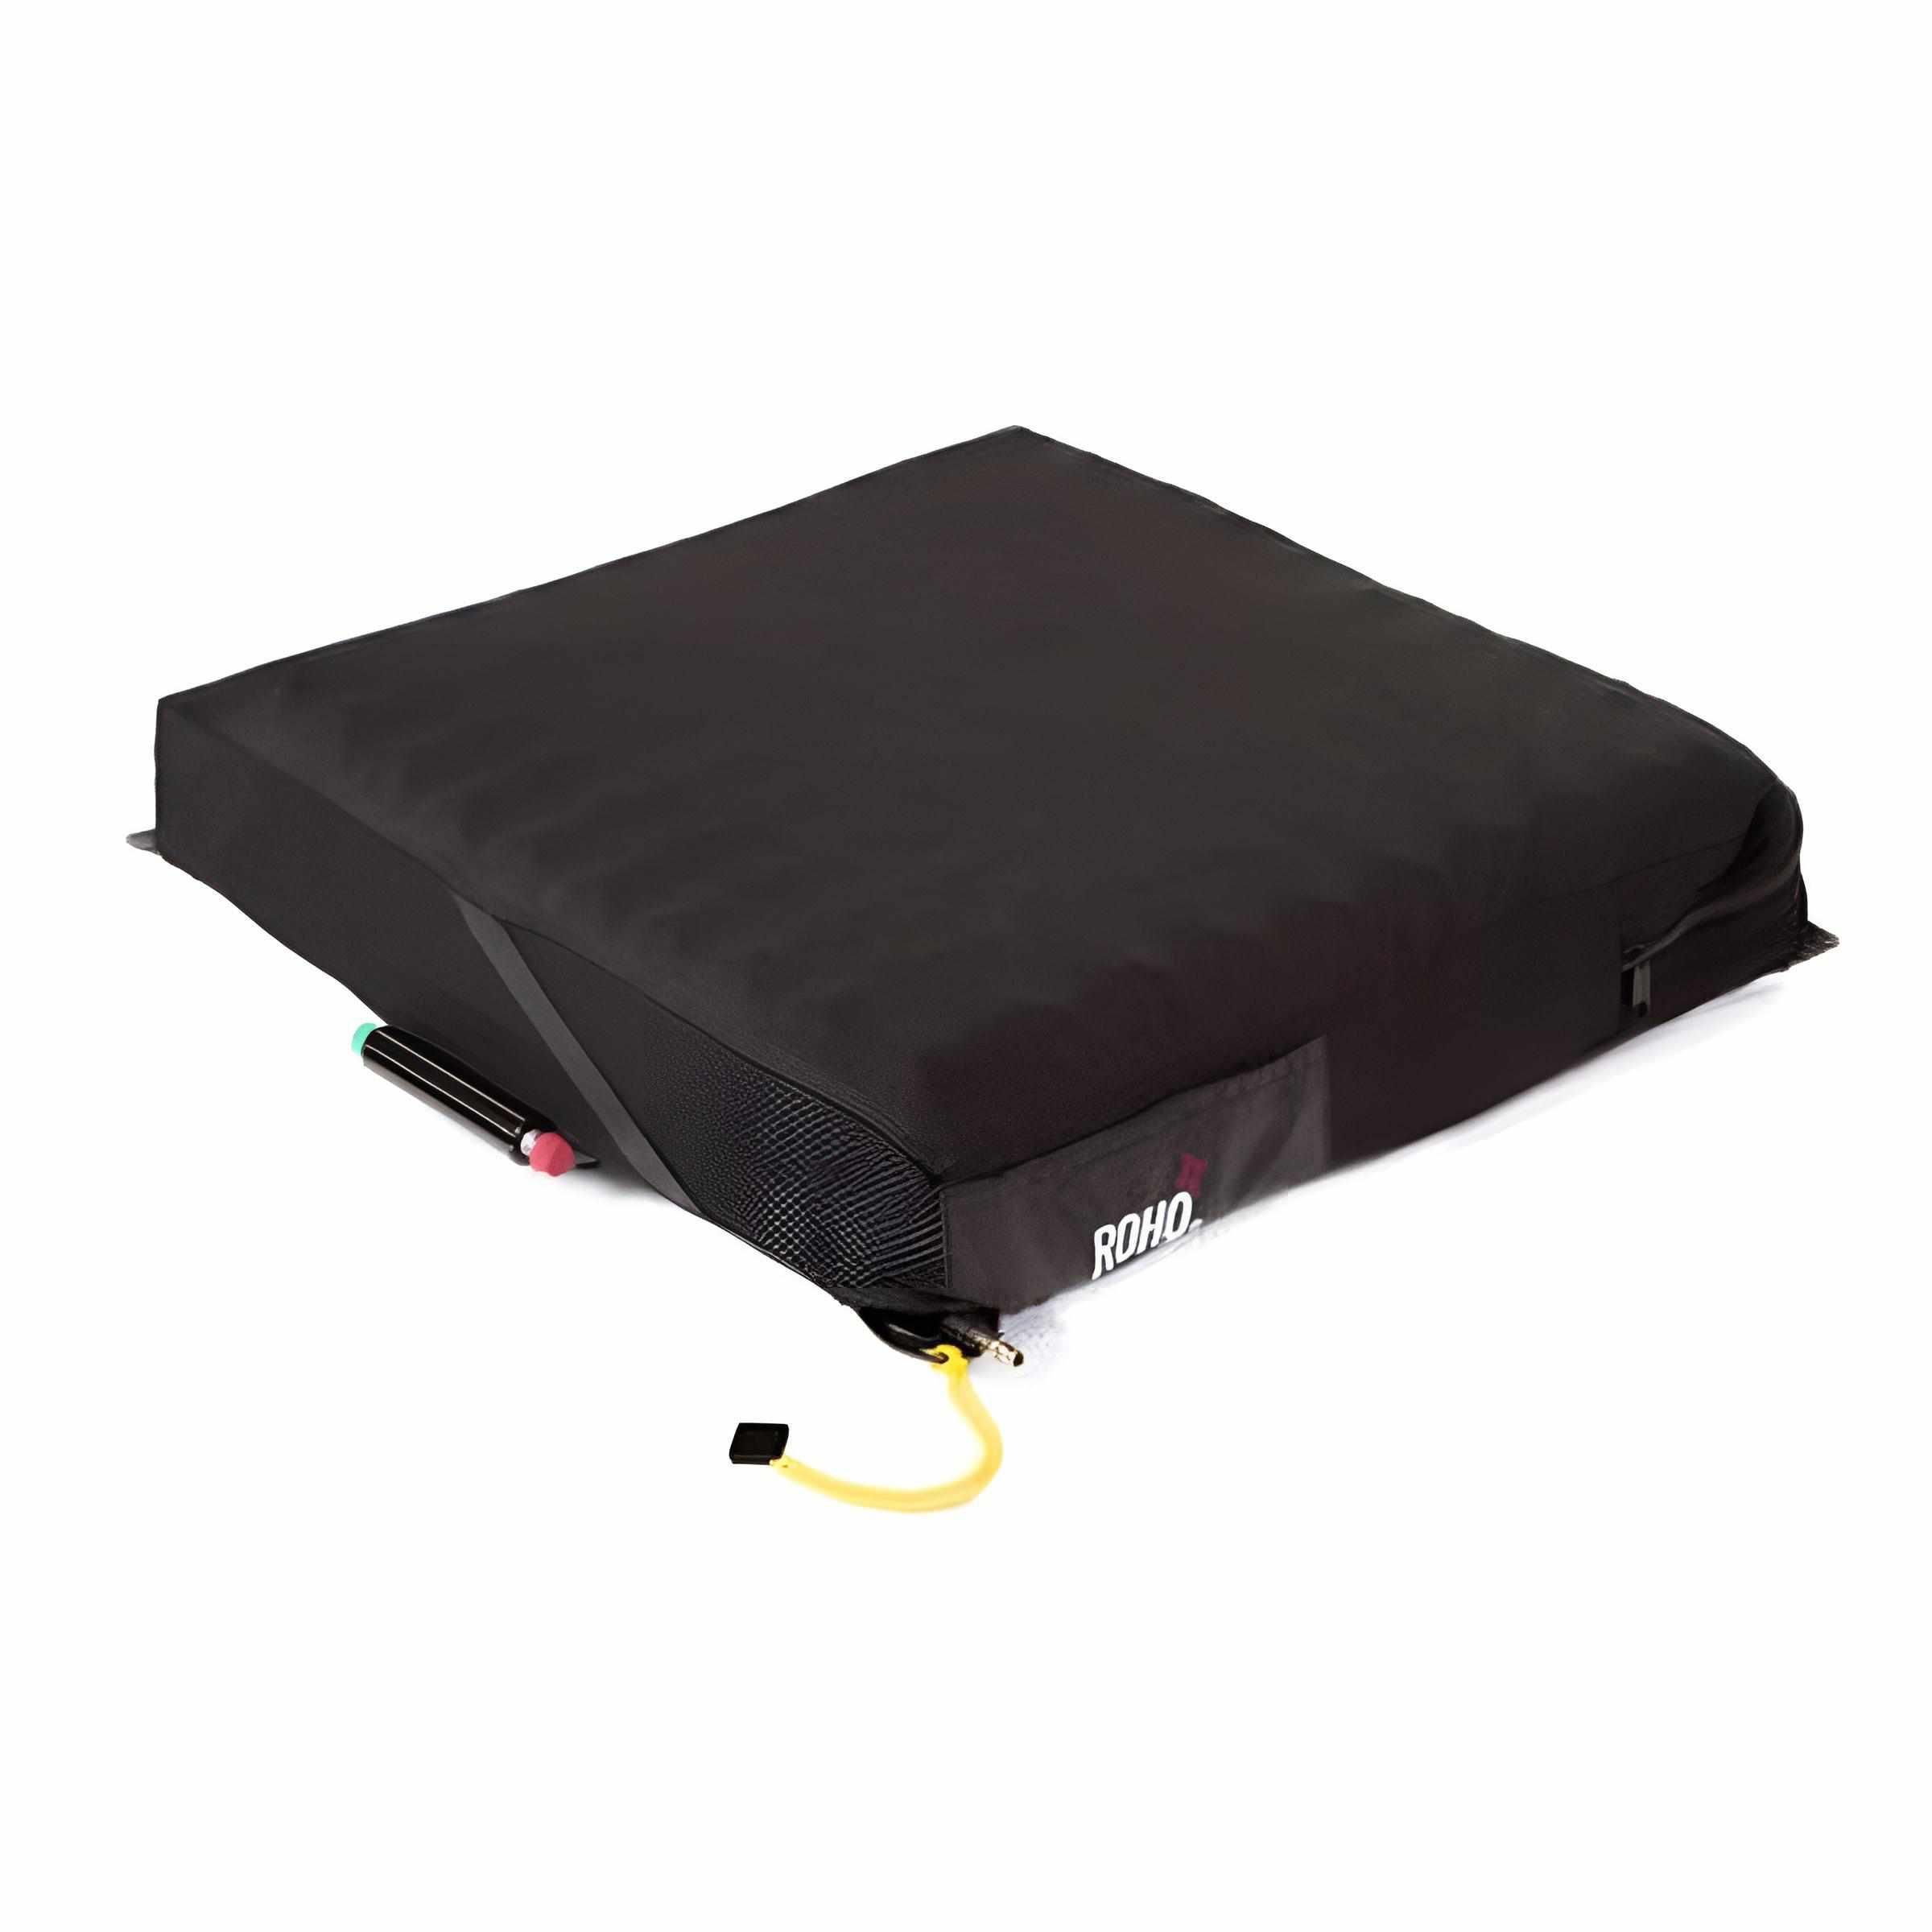 Roho Quadtro select high profile cushion with cover